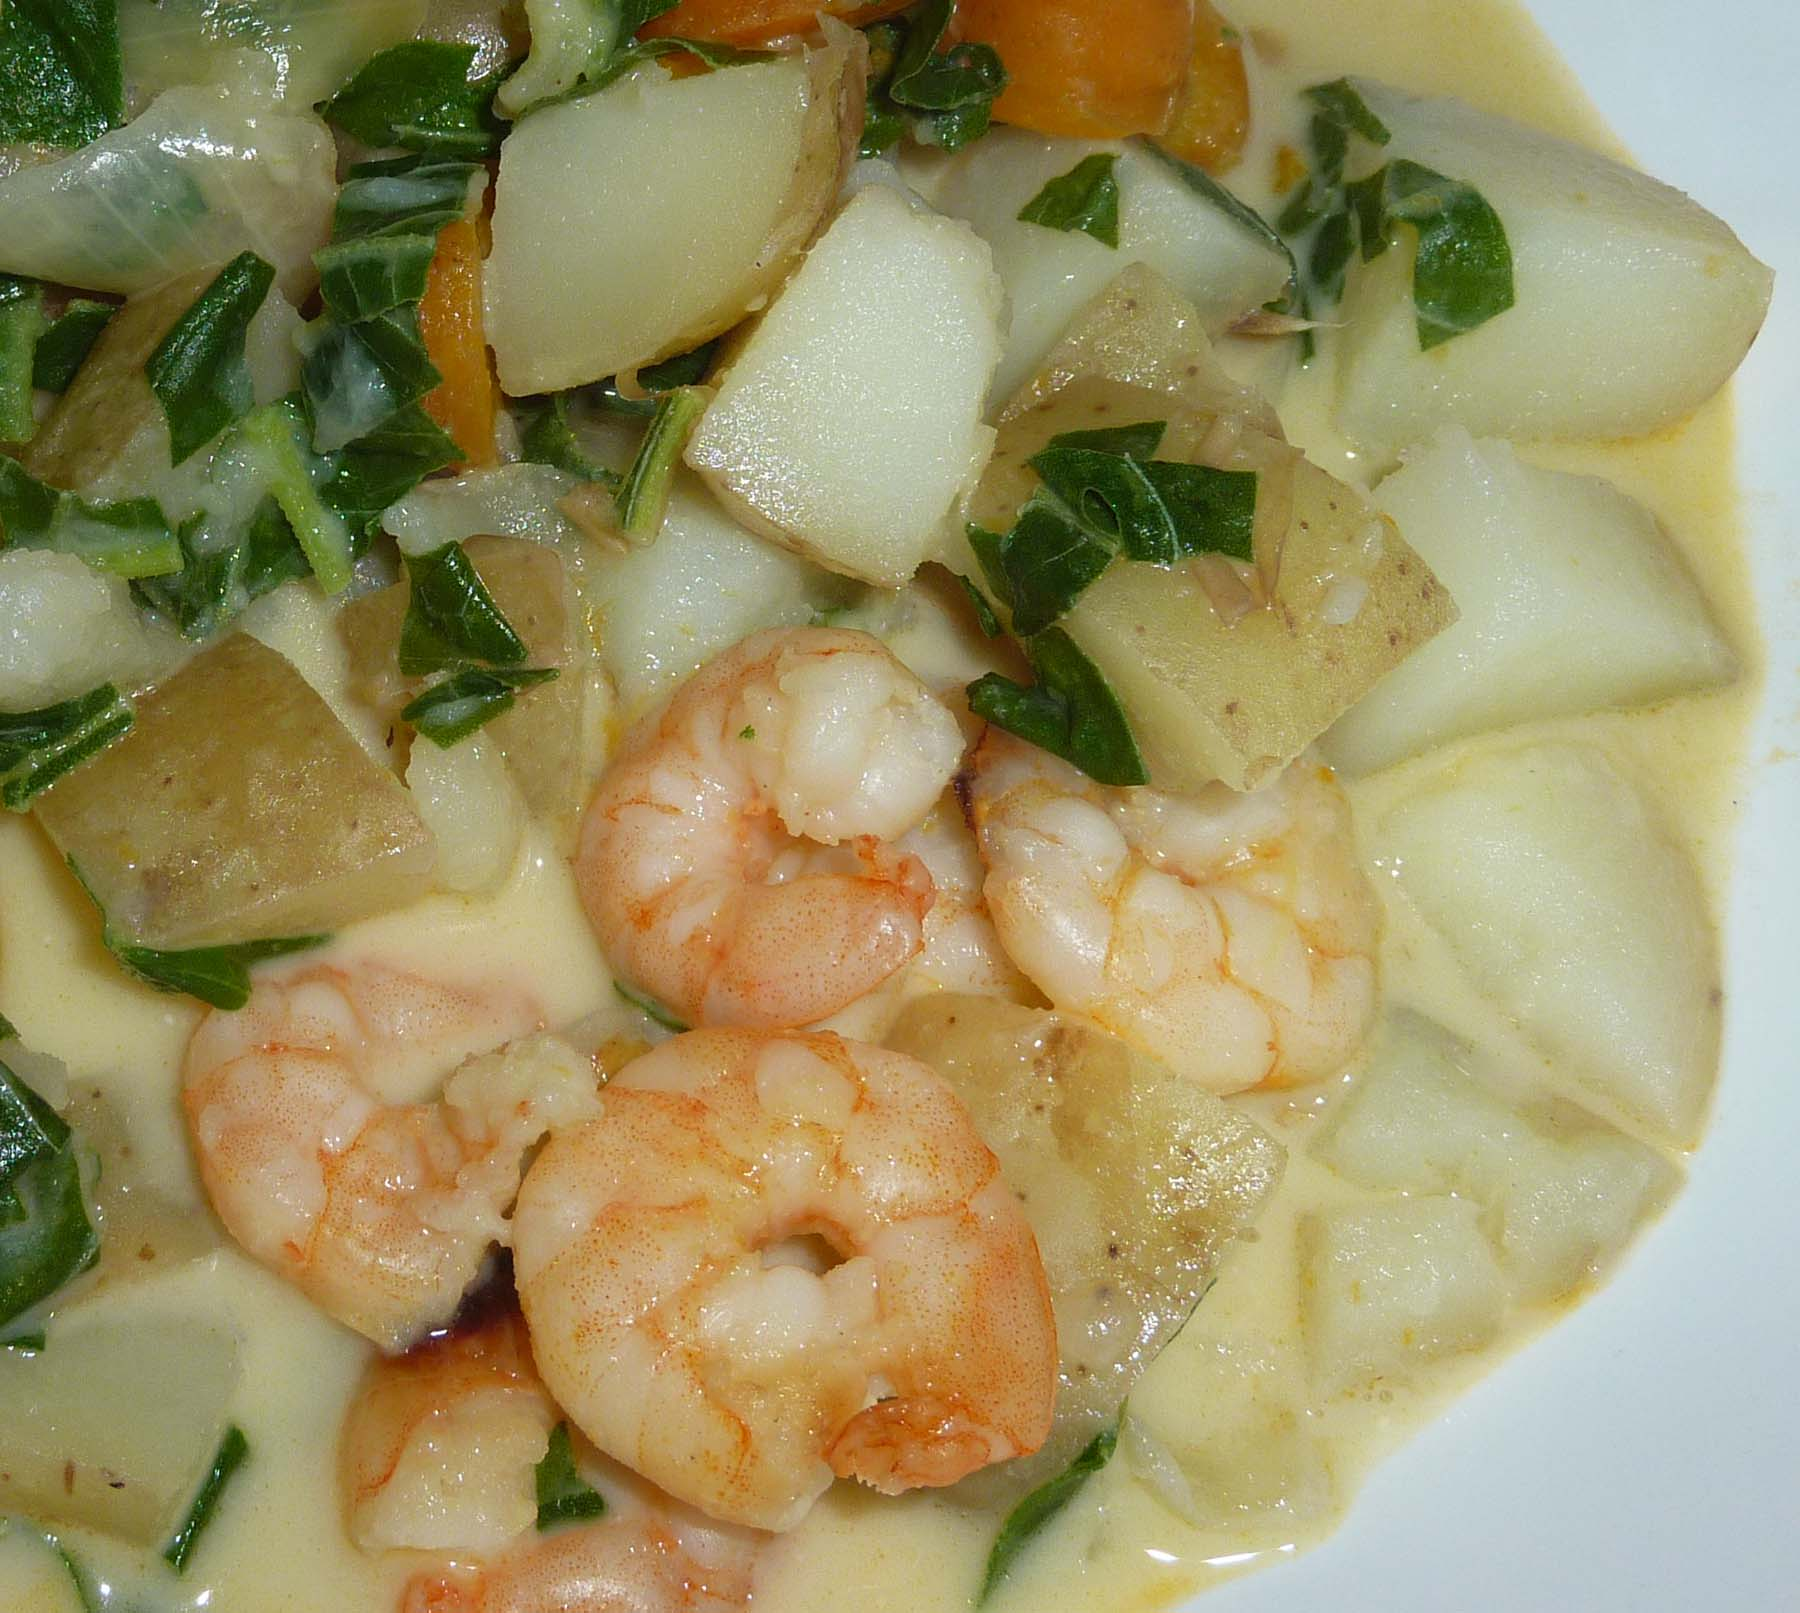 homemade vegetable souphttpwww thedailygreen prawn chowder